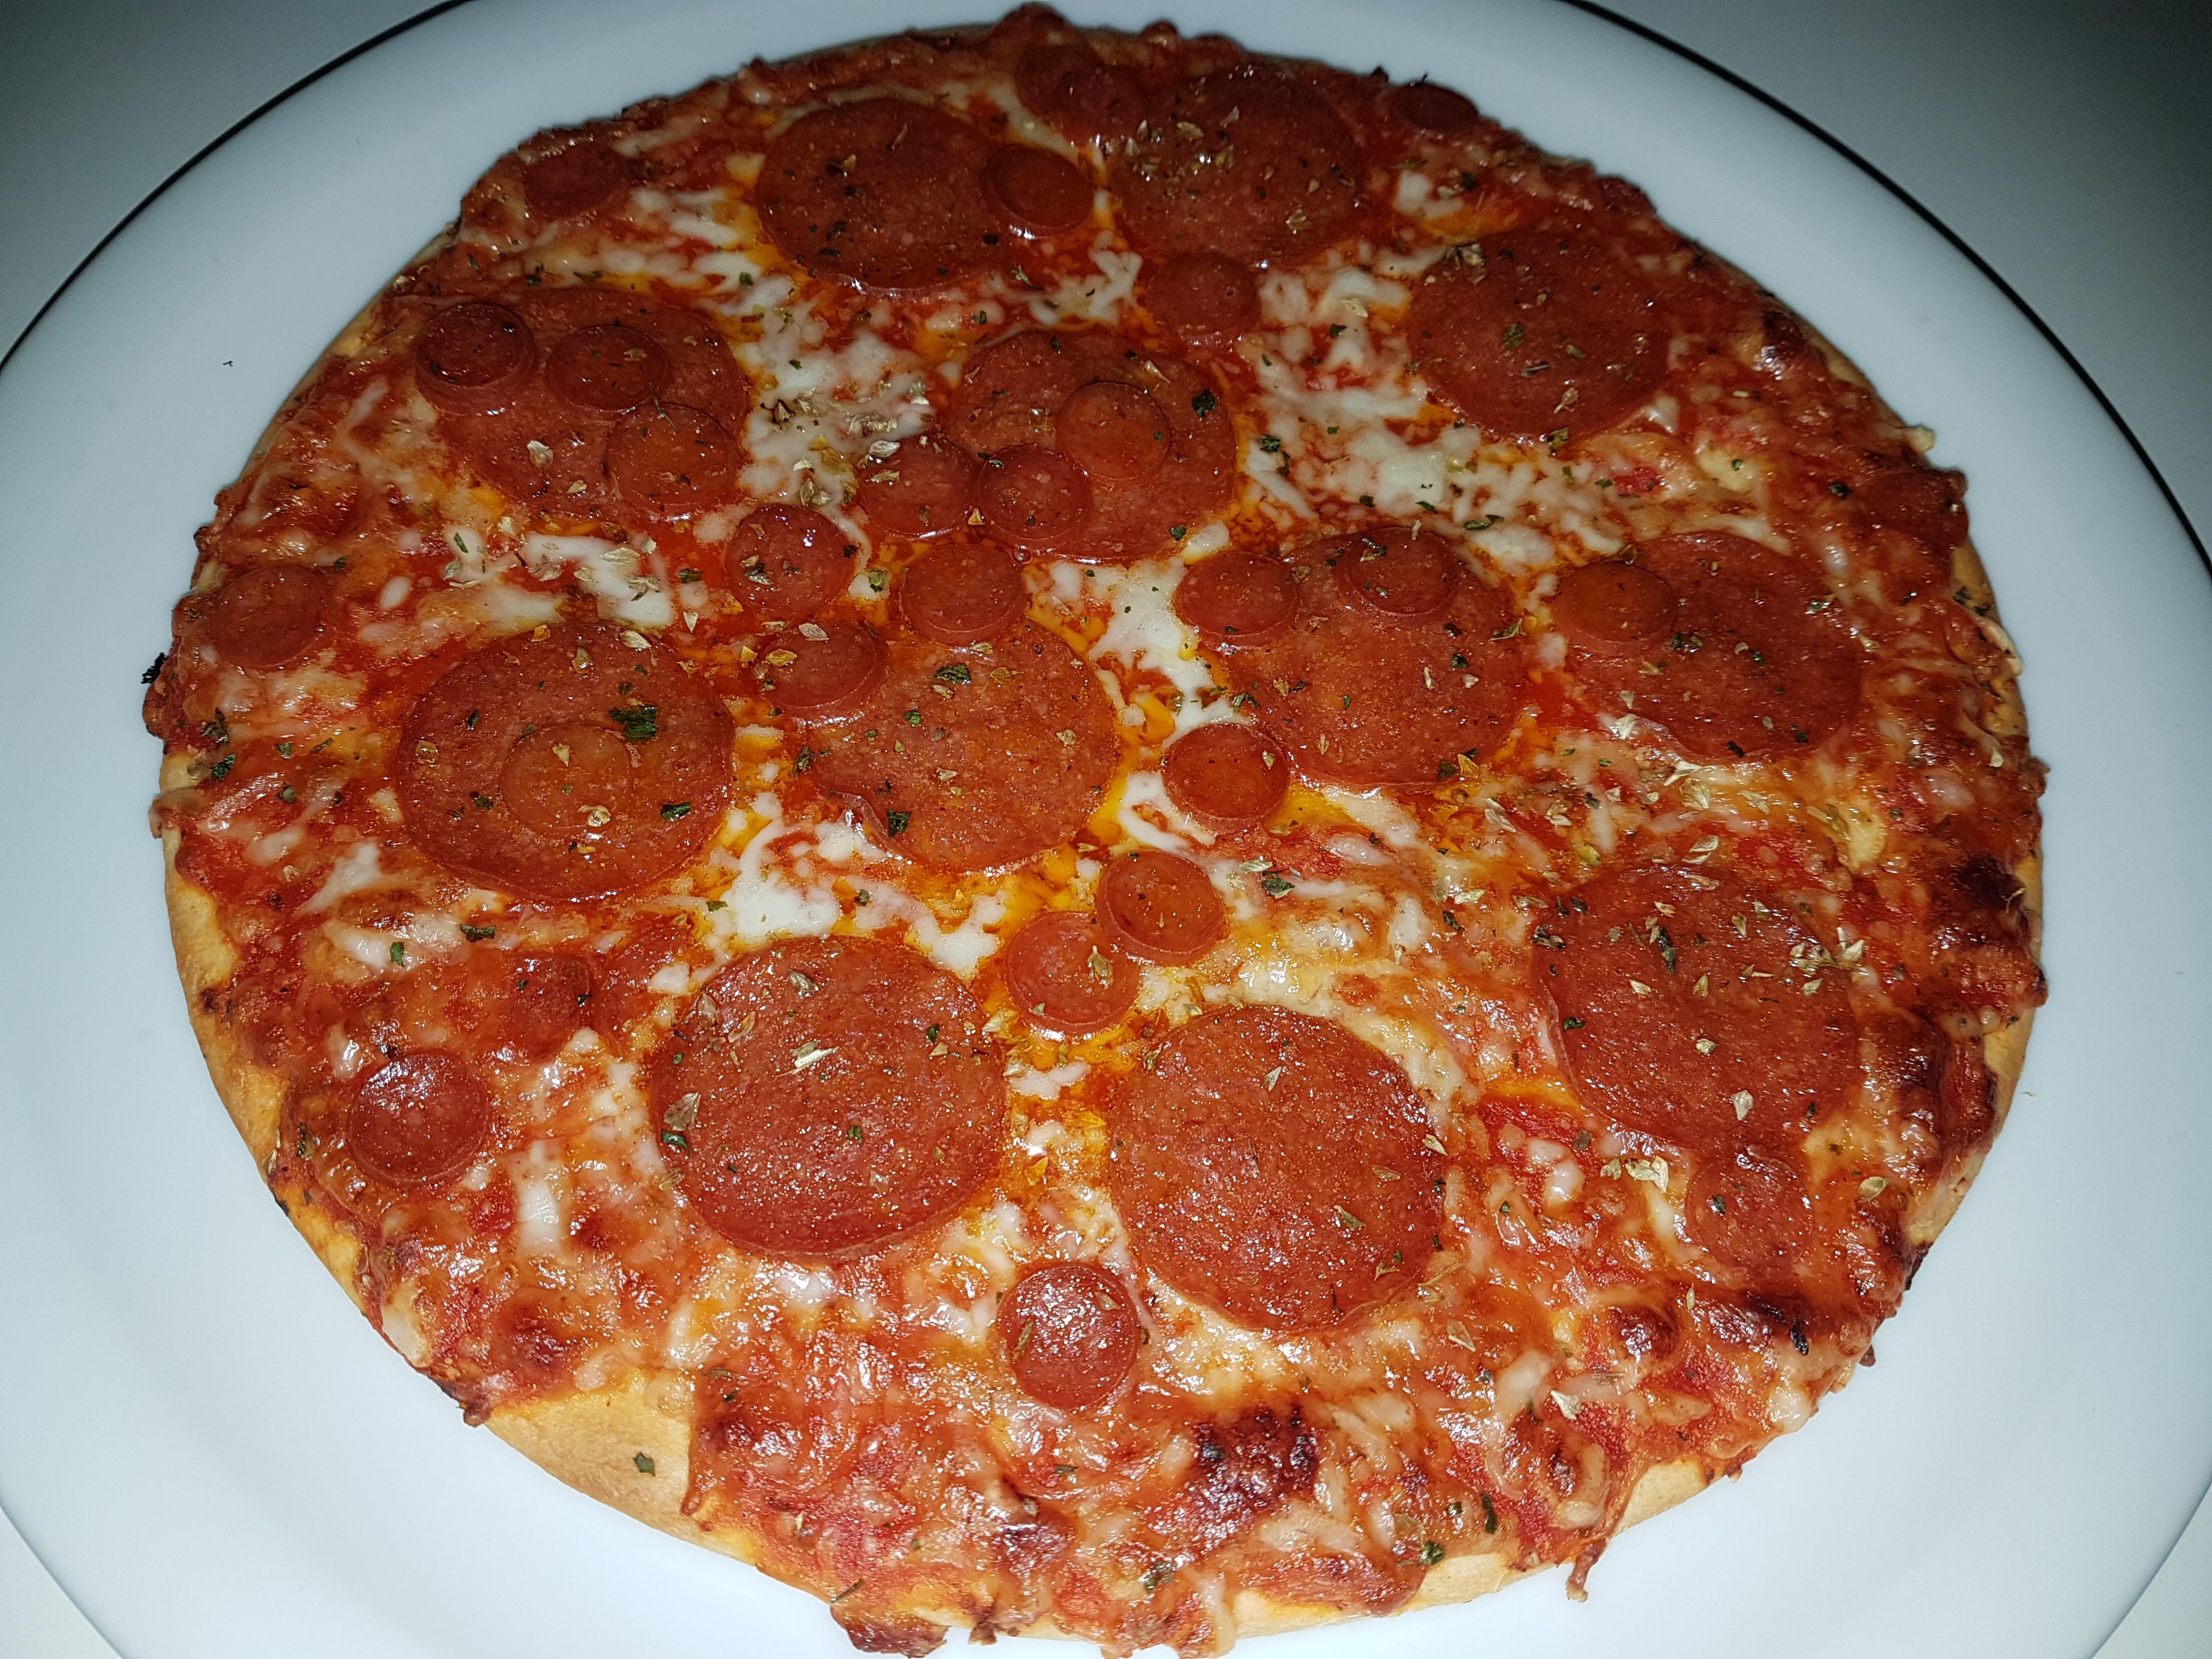 http://foodloader.net/Holz_2018-09-02_Pizza.jpg